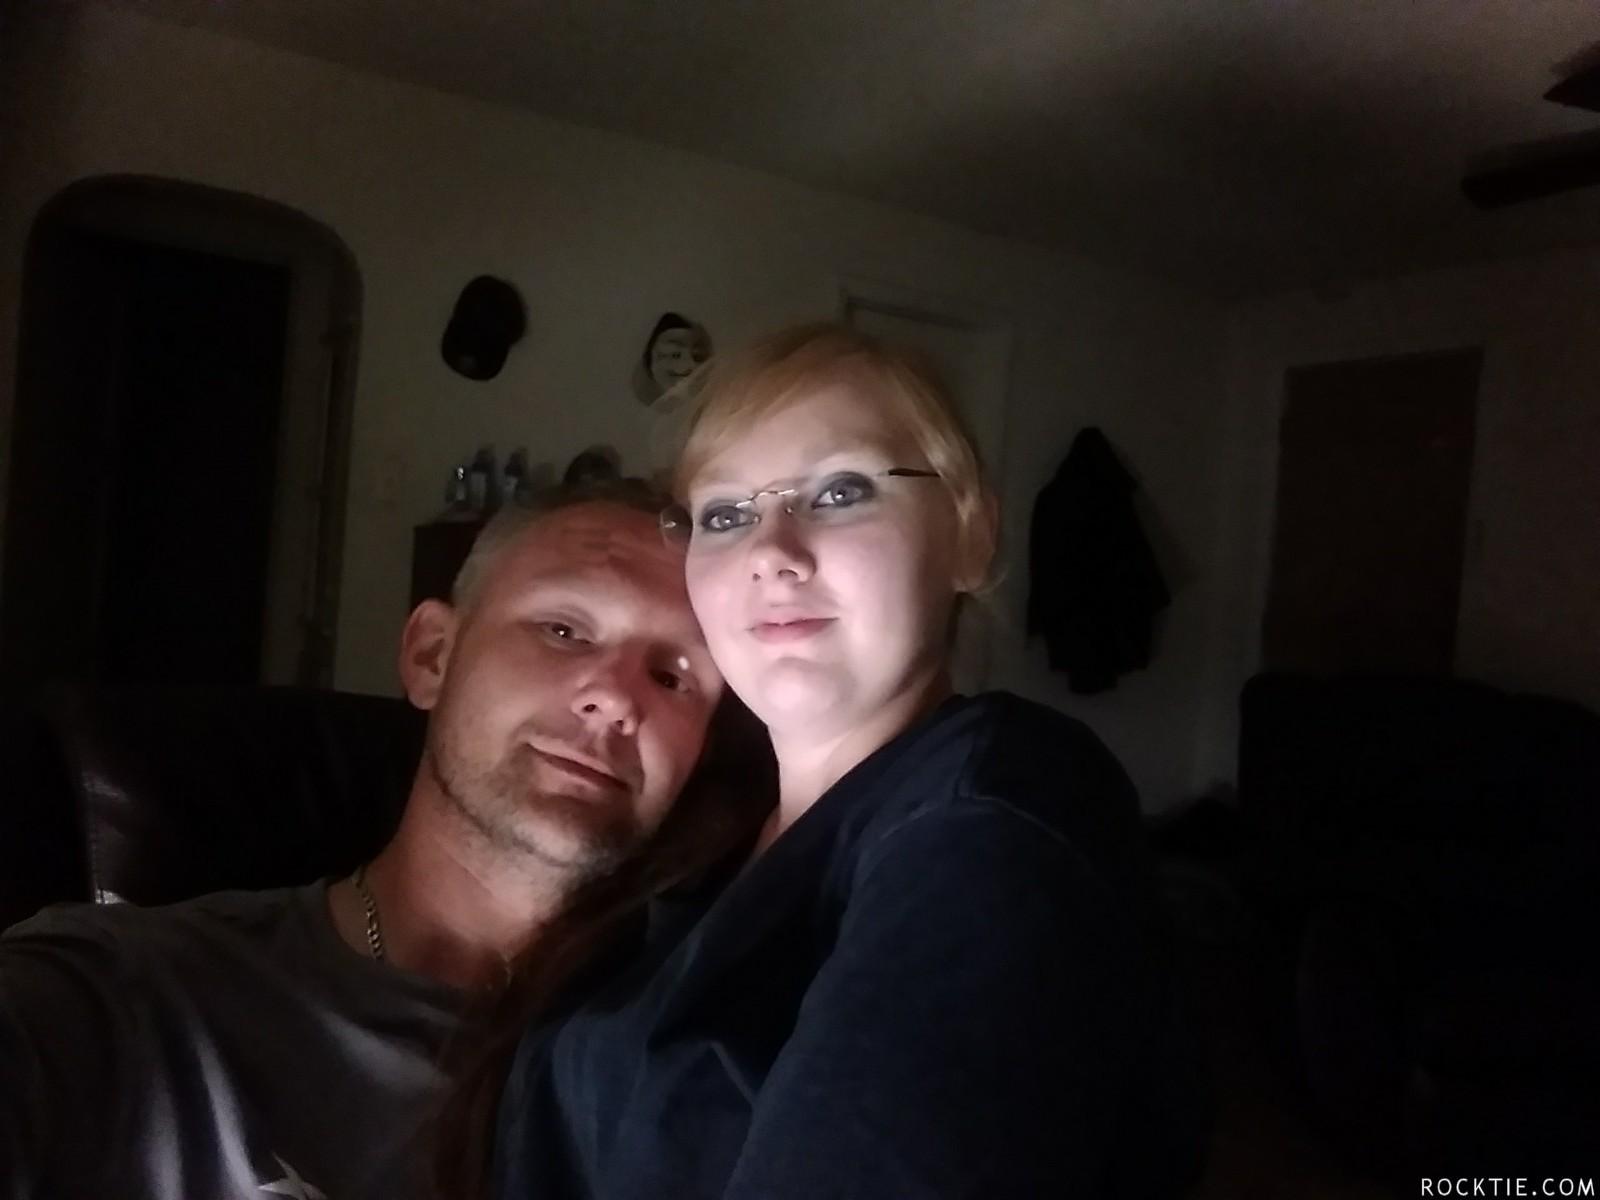 Swingers Hotwife Cuckold Wichita Kansas - OneToughChicken